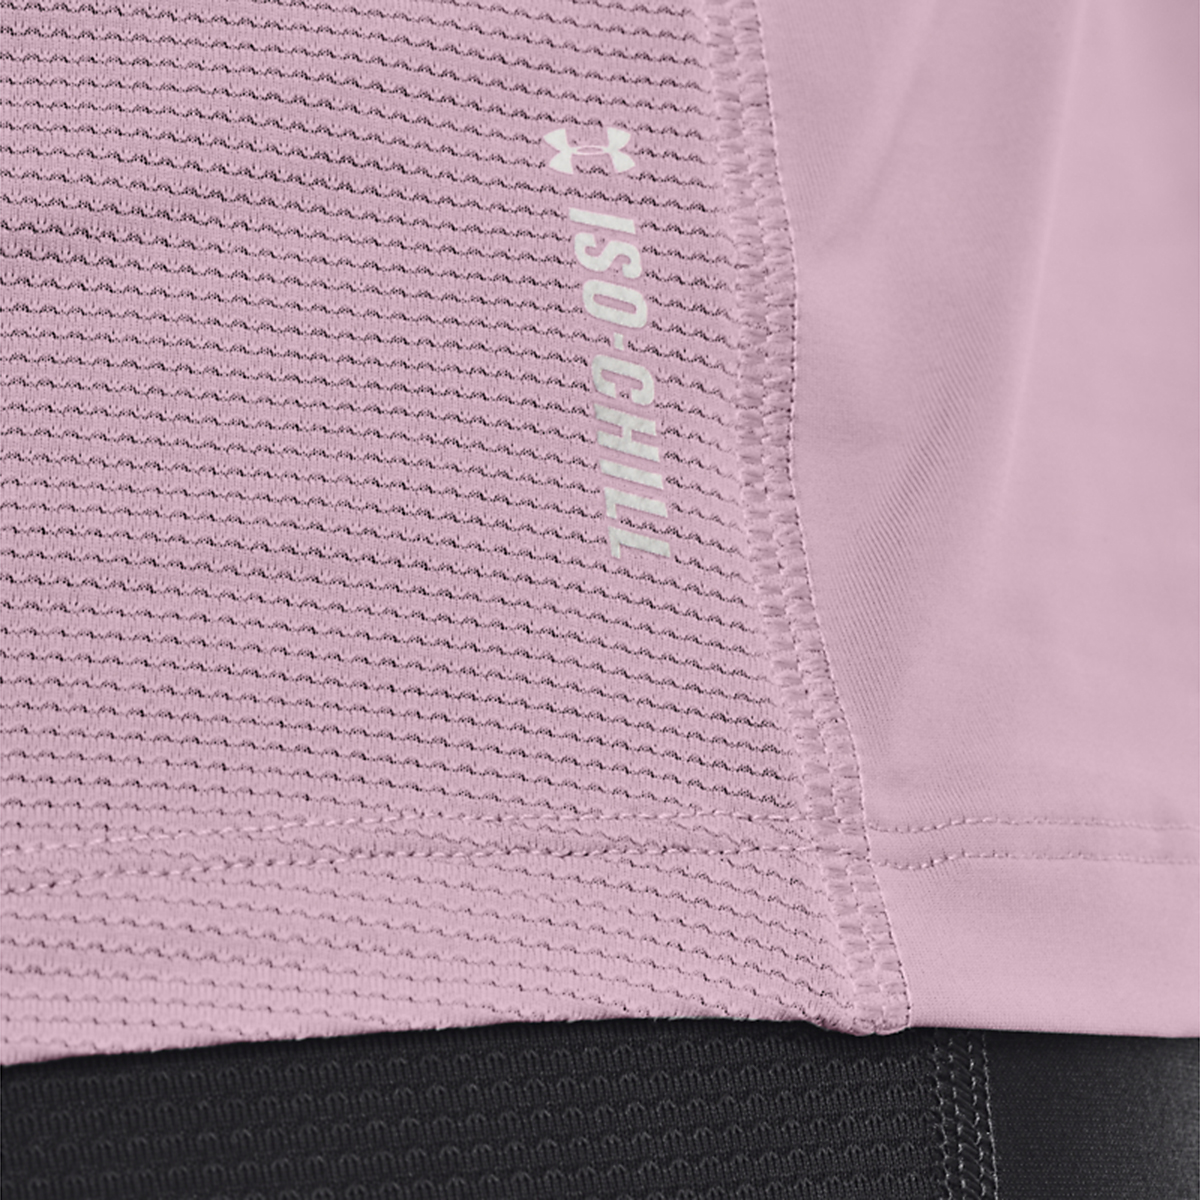 Women's Under Armour Iso-Chill Run 200 Tank - Color: Mauve Pink/Mauve Pink/Reflective - Size: XS, Mauve Pink/Mauve Pink/Reflective, large, image 4